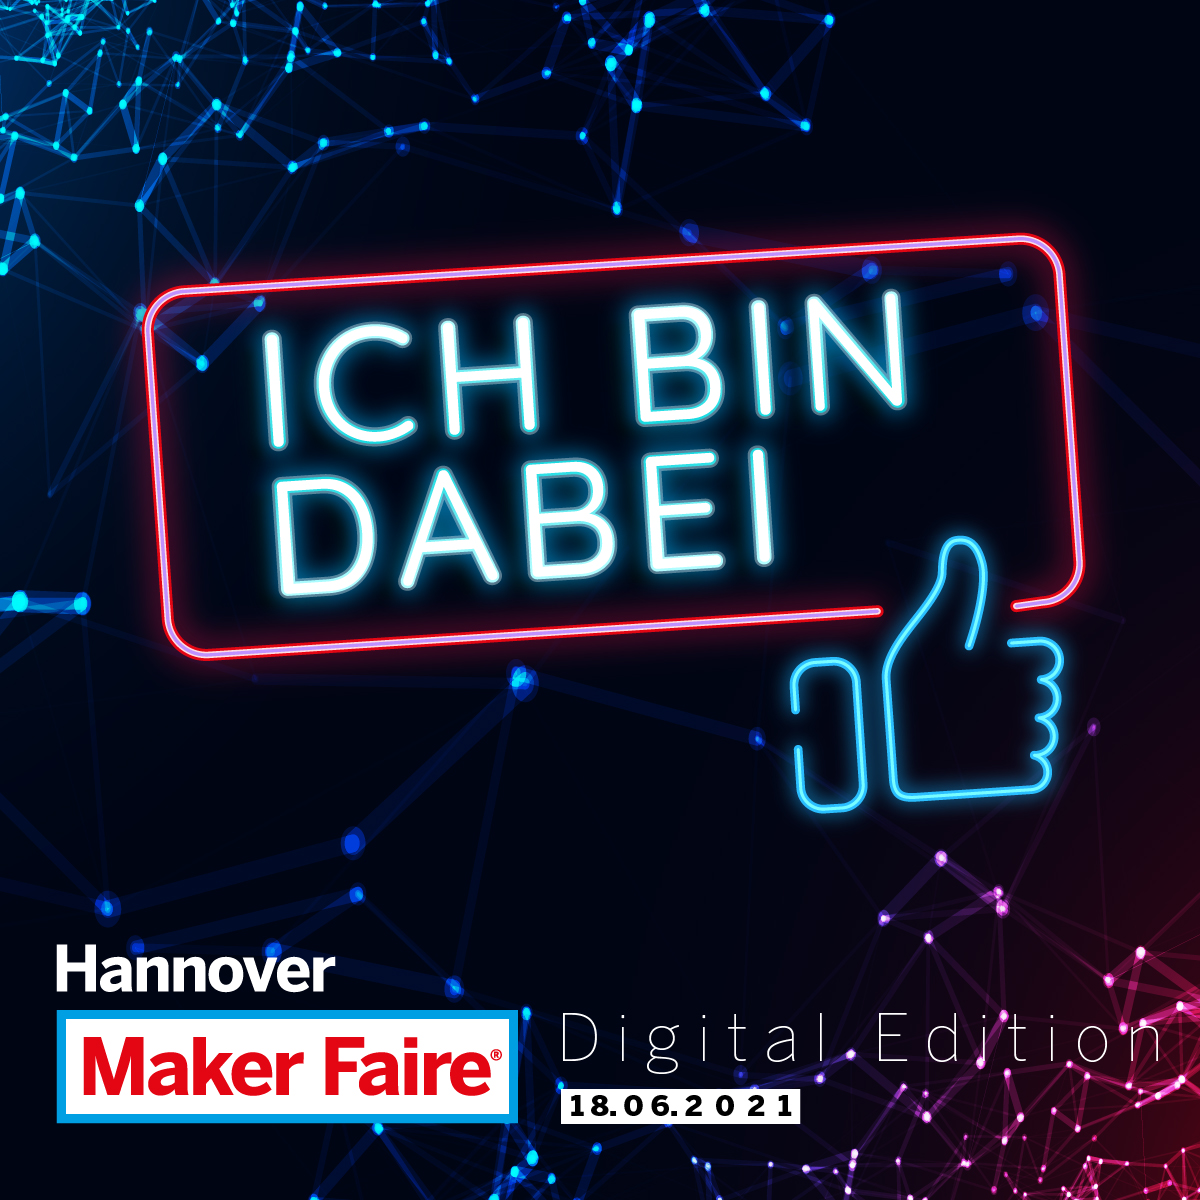 Maker Faire Hannover 2021 - Digital Edition 1/2